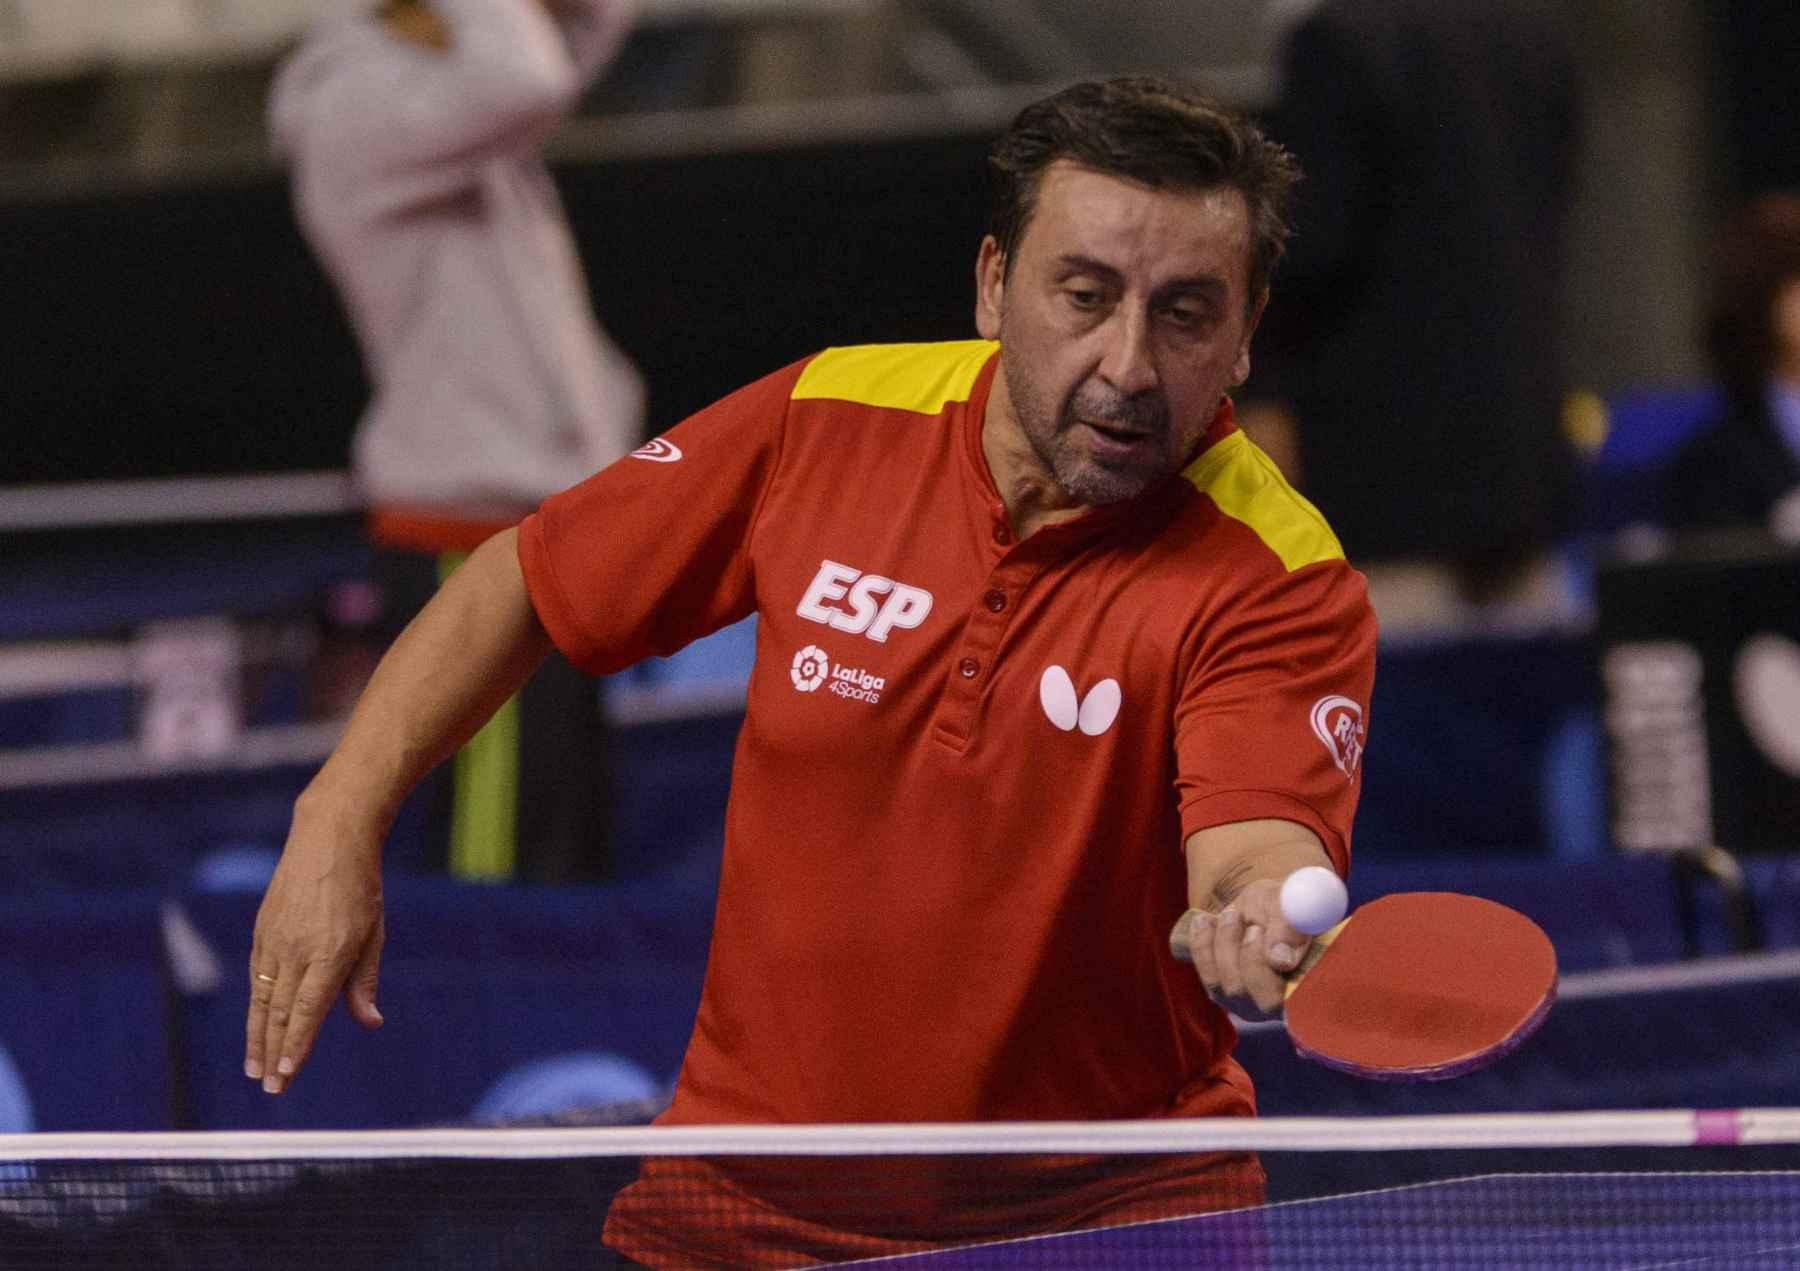 Juan Bautista Pérez disputando el Spanish Open 2017